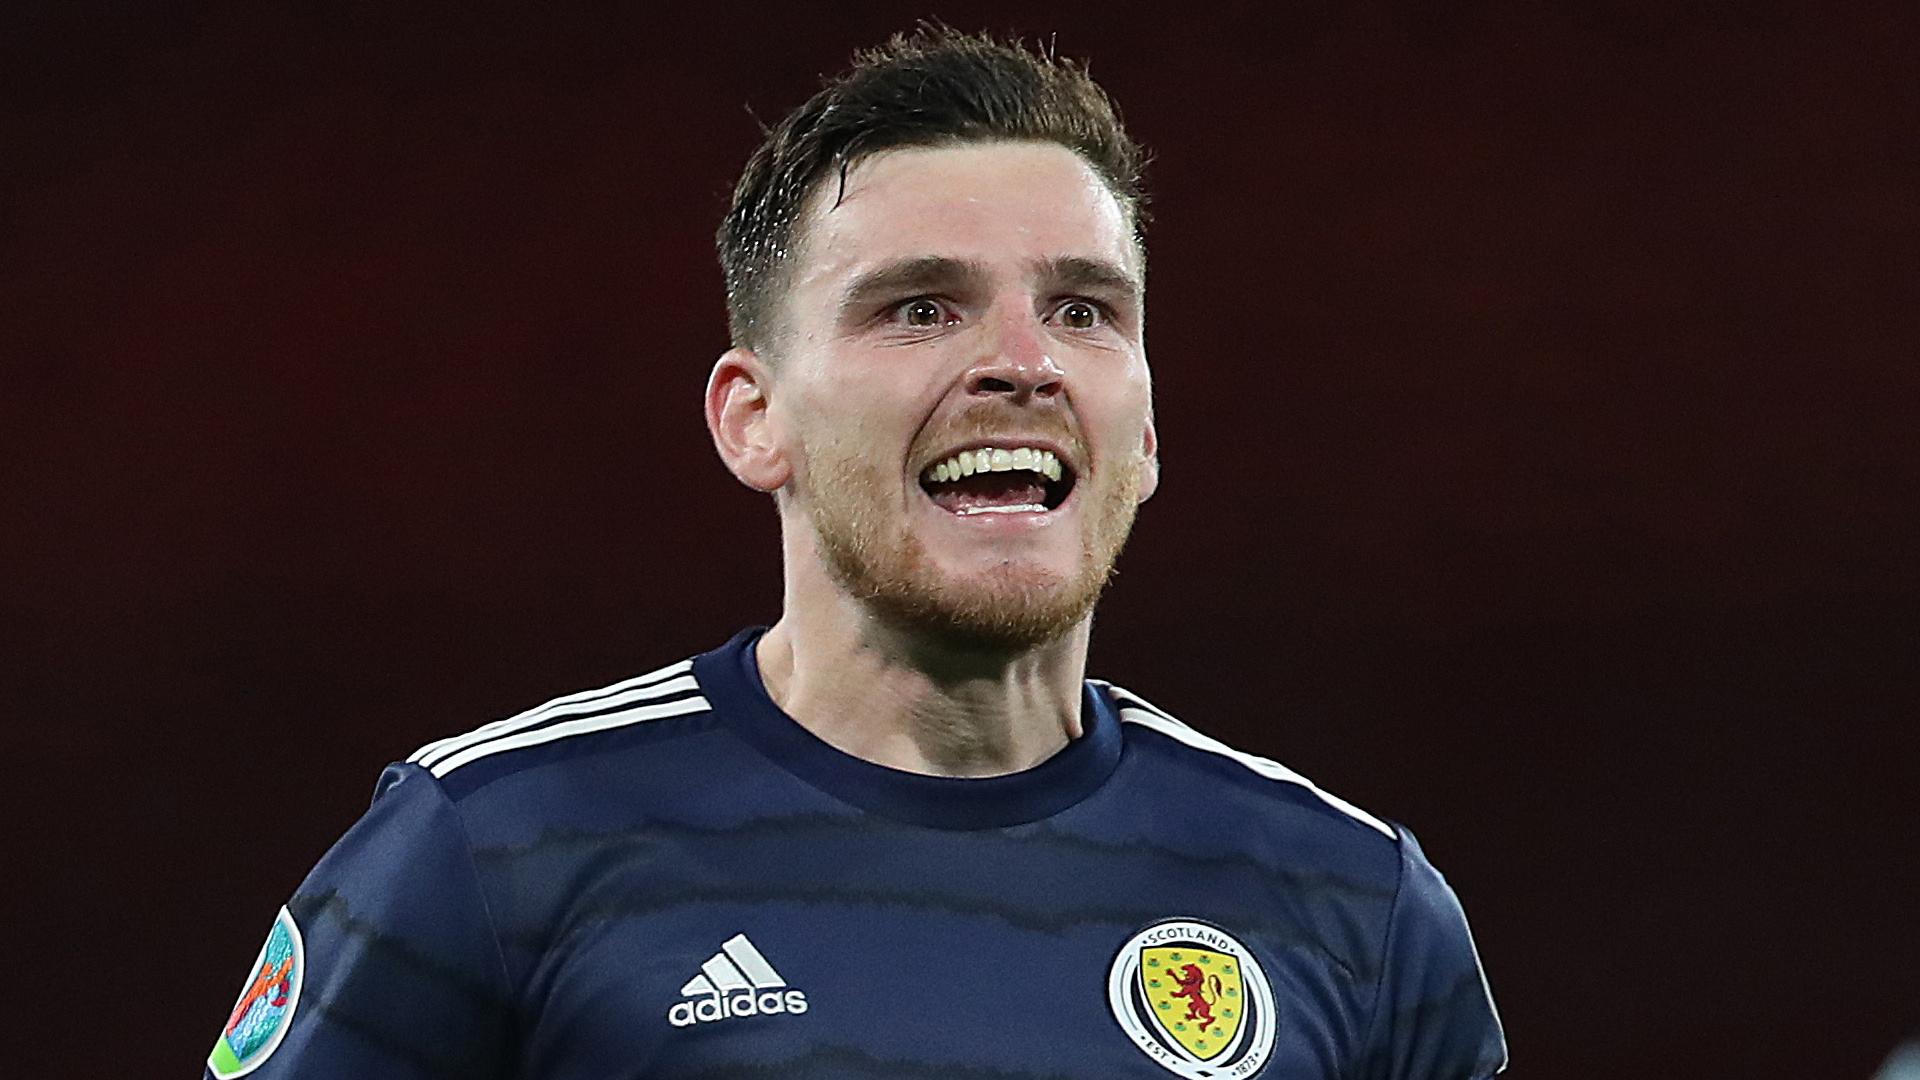 Robertson a rarity in having 'fond memories' of 2020 as Liverpool & Scotland prosper